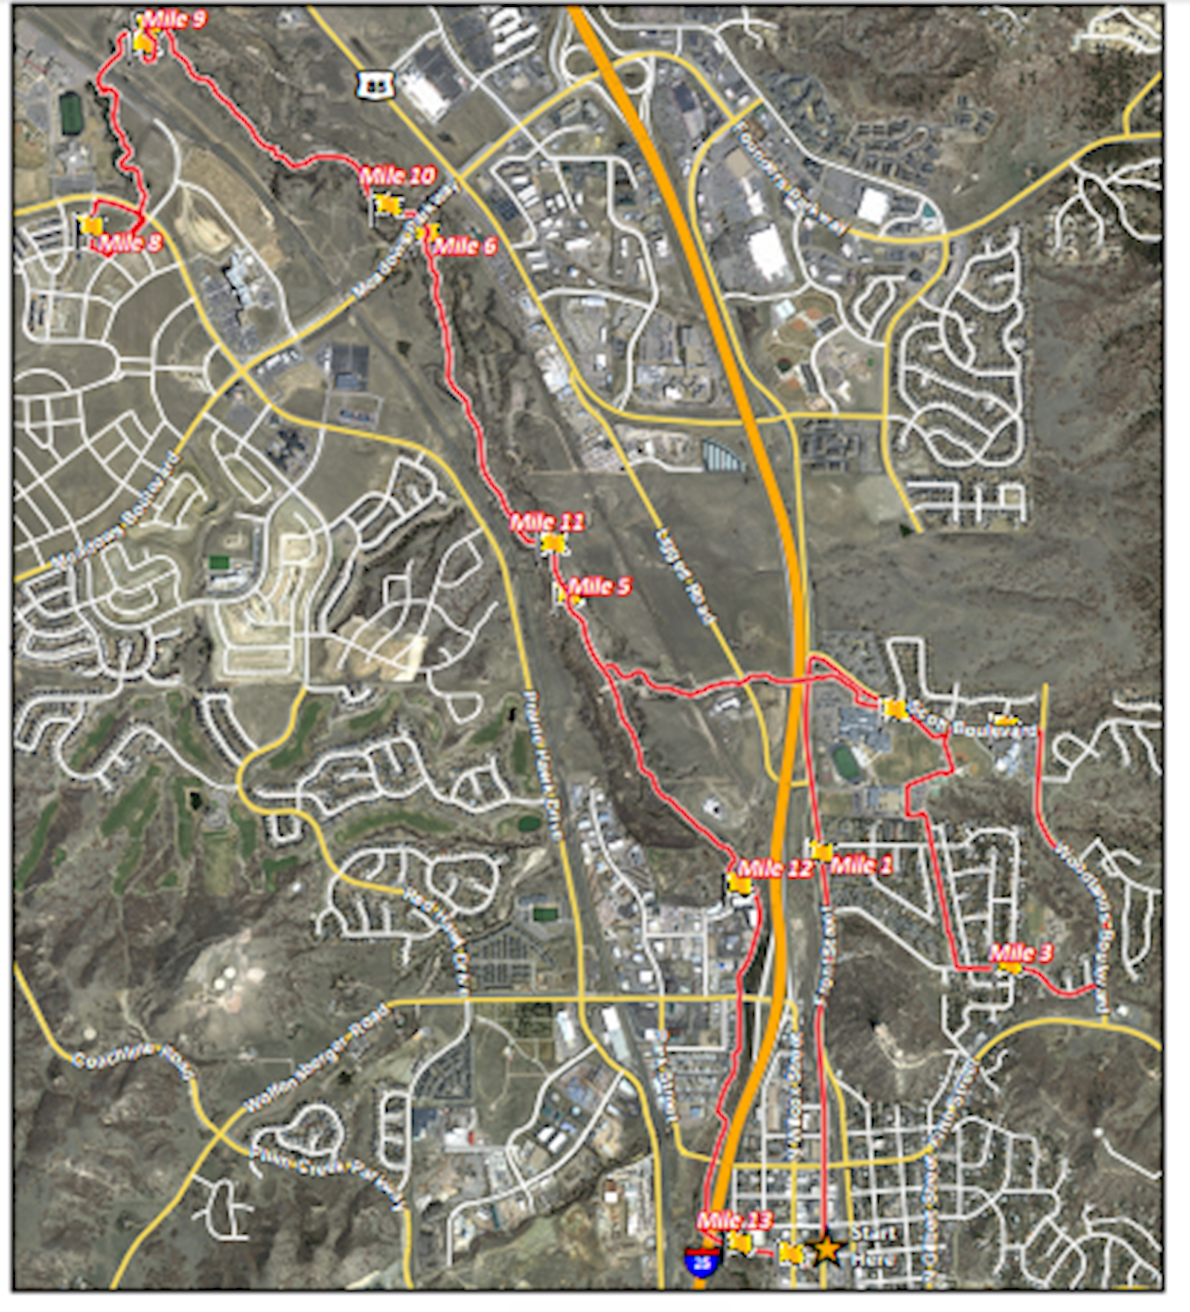 Castle Rock Half Marathon Mappa del percorso